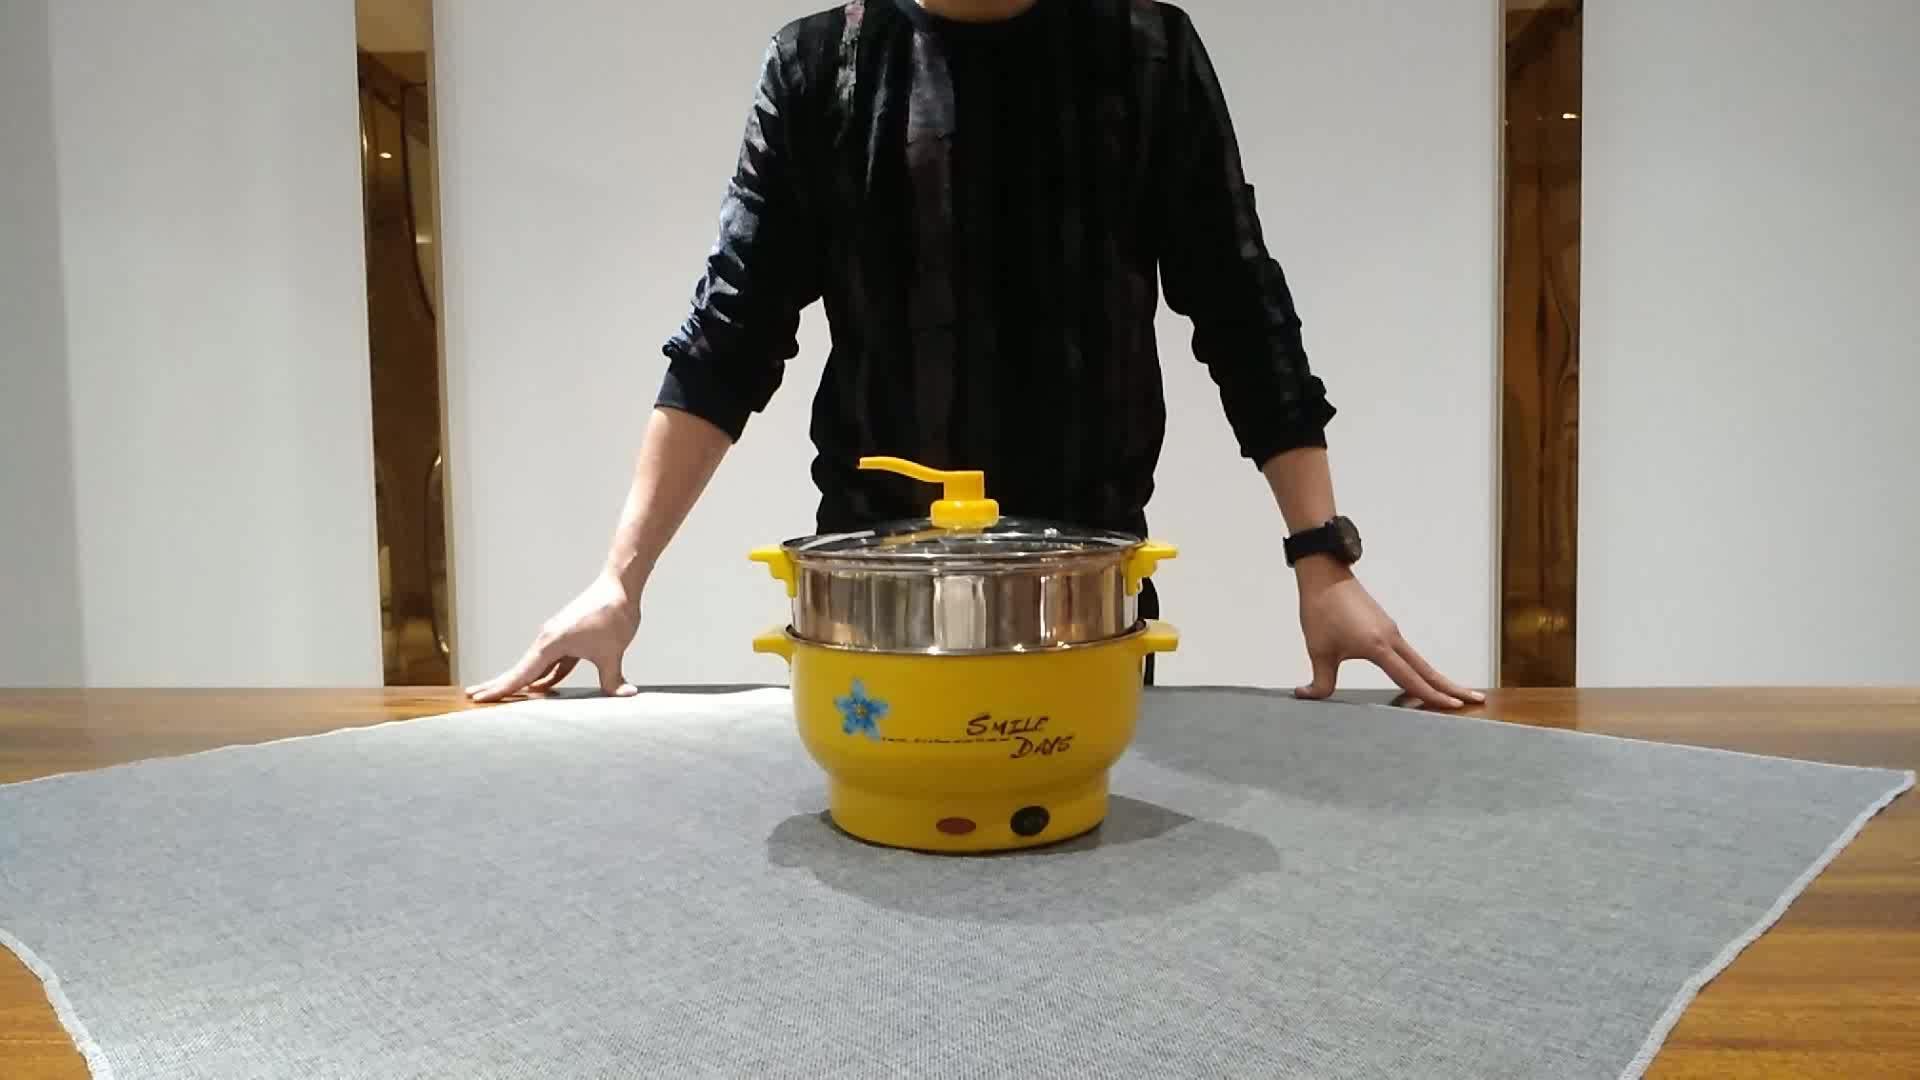 Hgステンレス鋼電気調理鍋